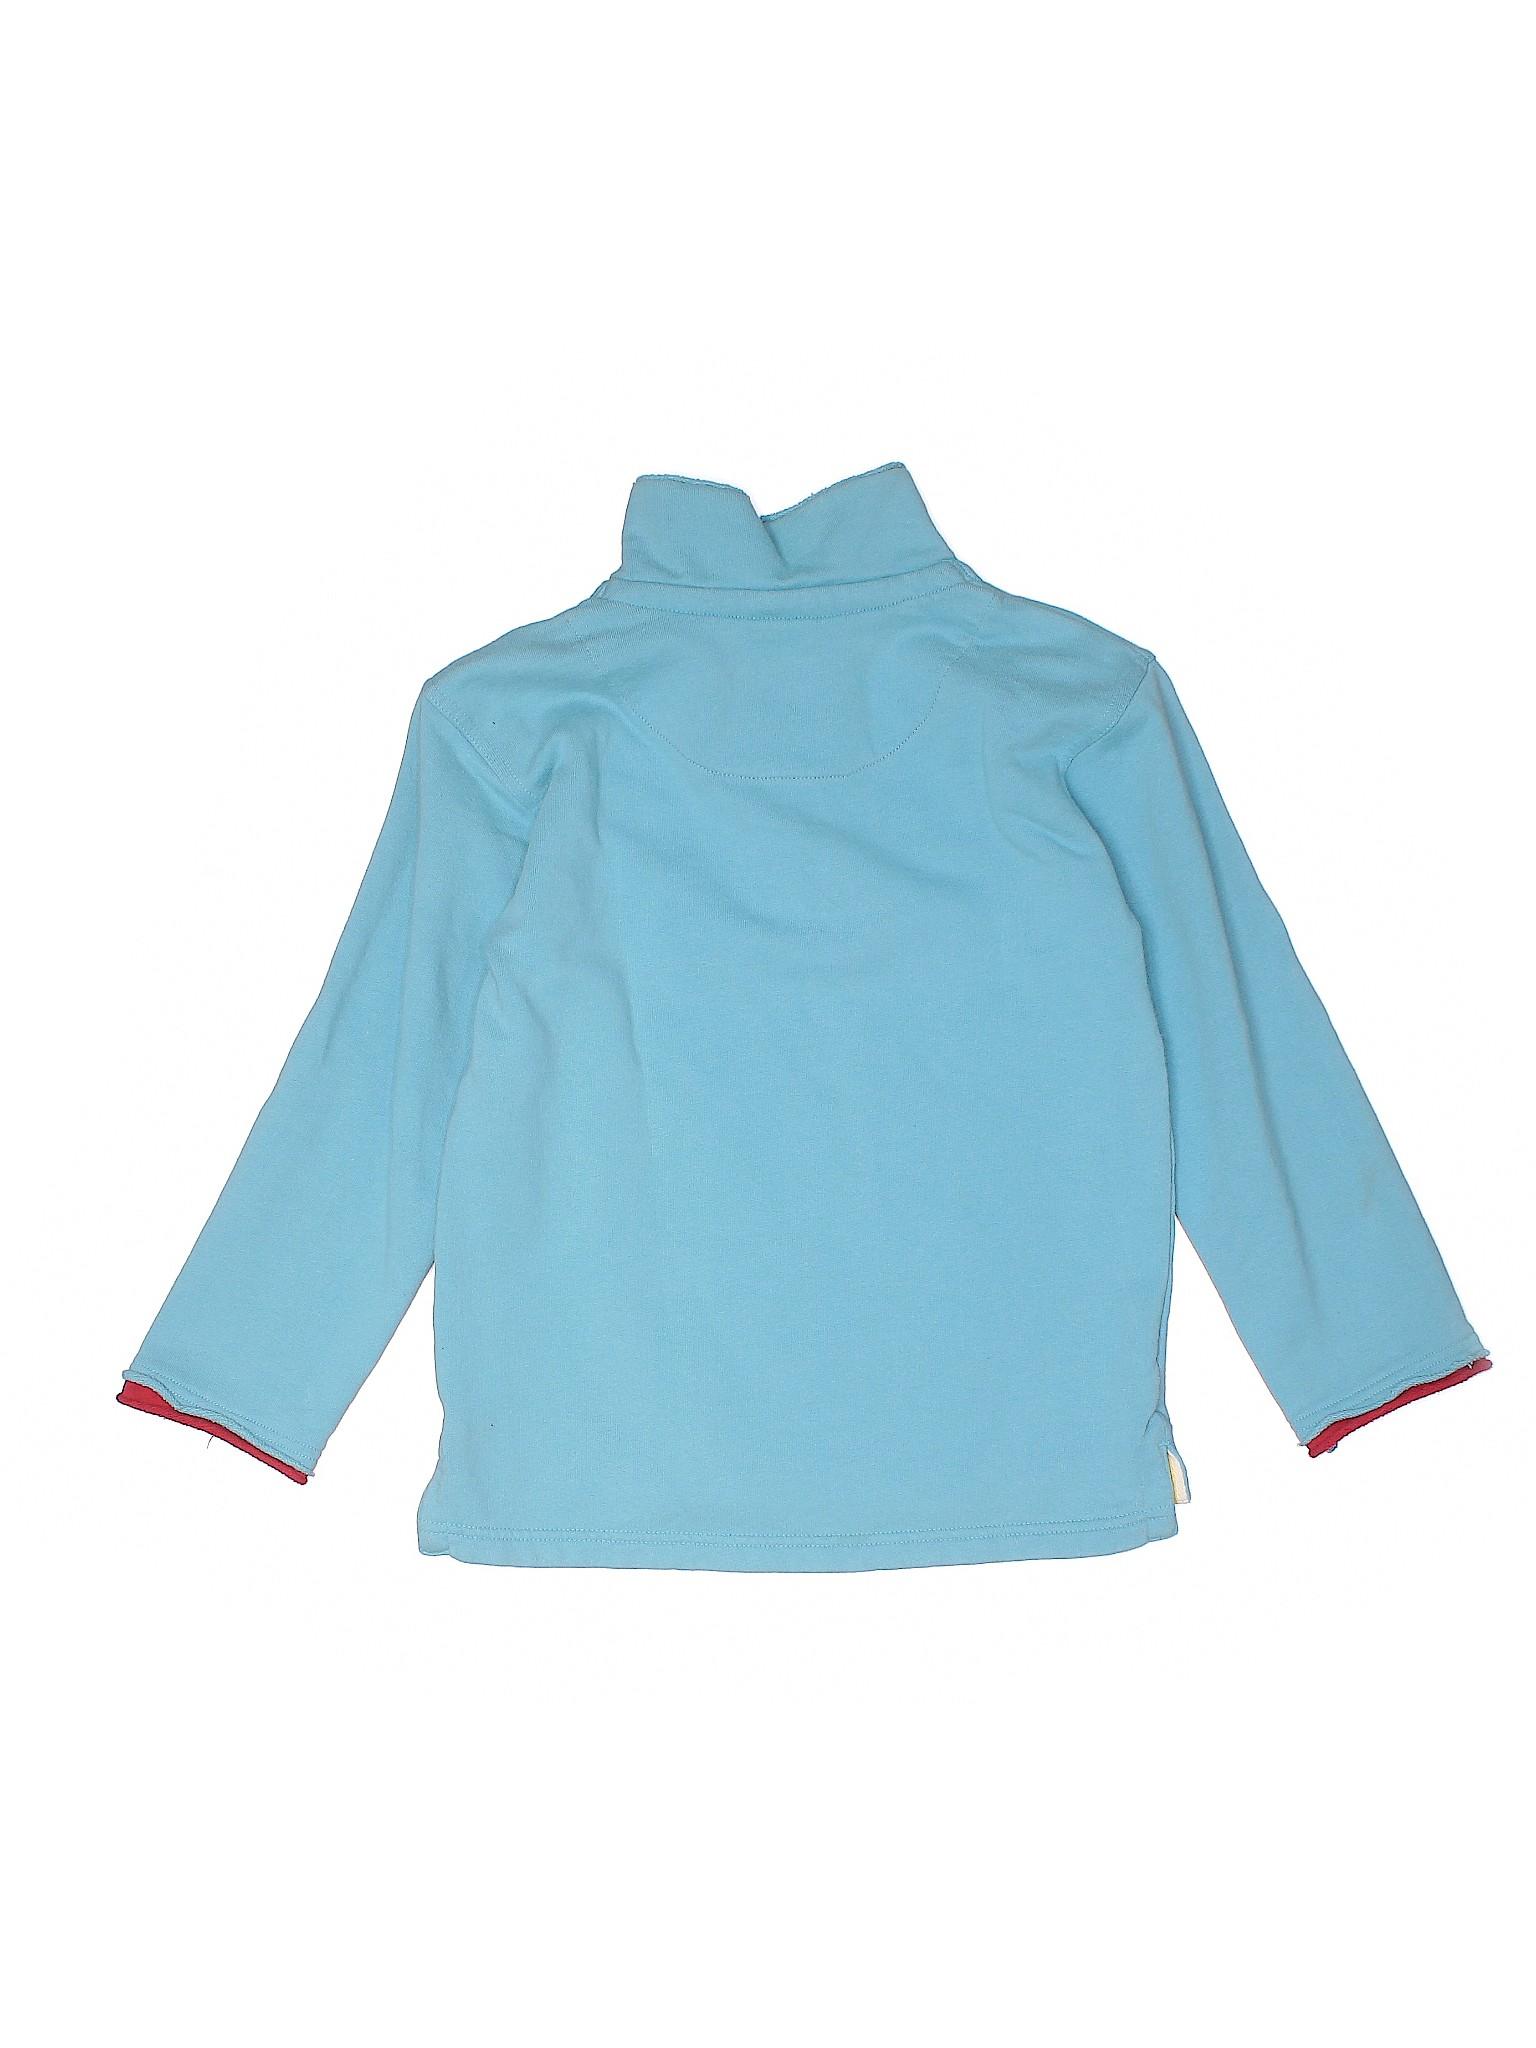 249f44ce7 Pullover Sweater